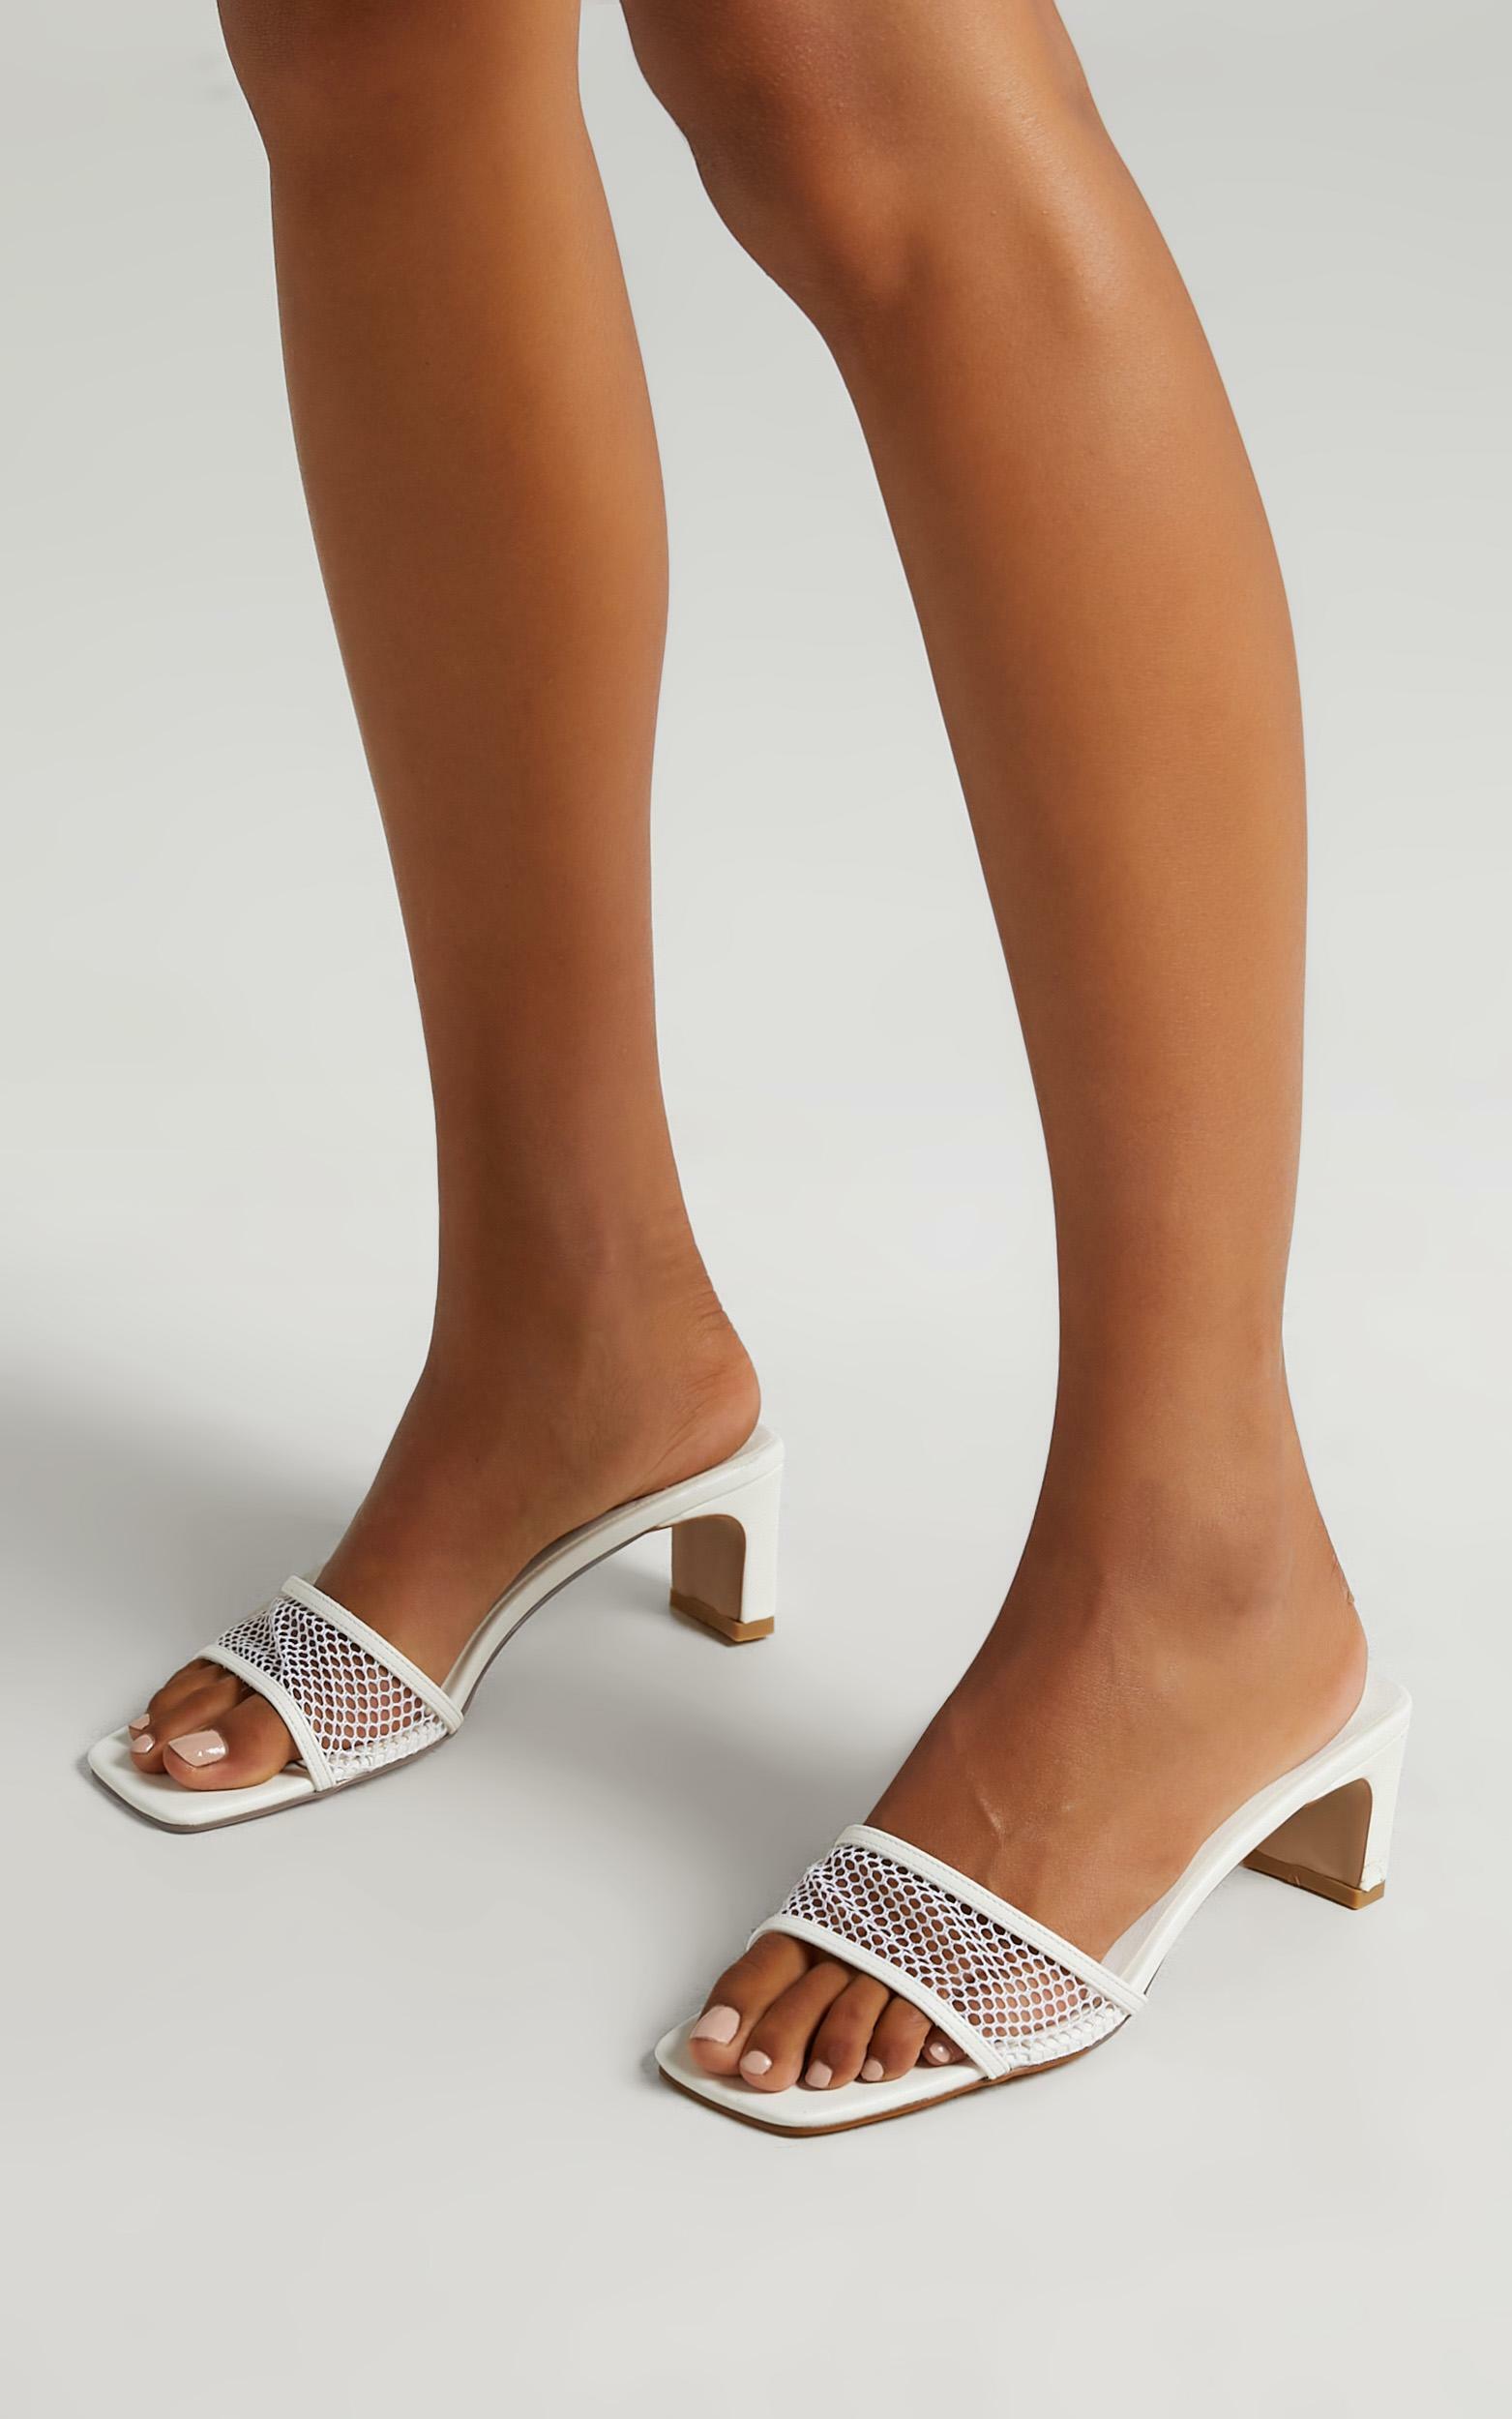 Billini - Gatton Heels in White - 5, White, hi-res image number null